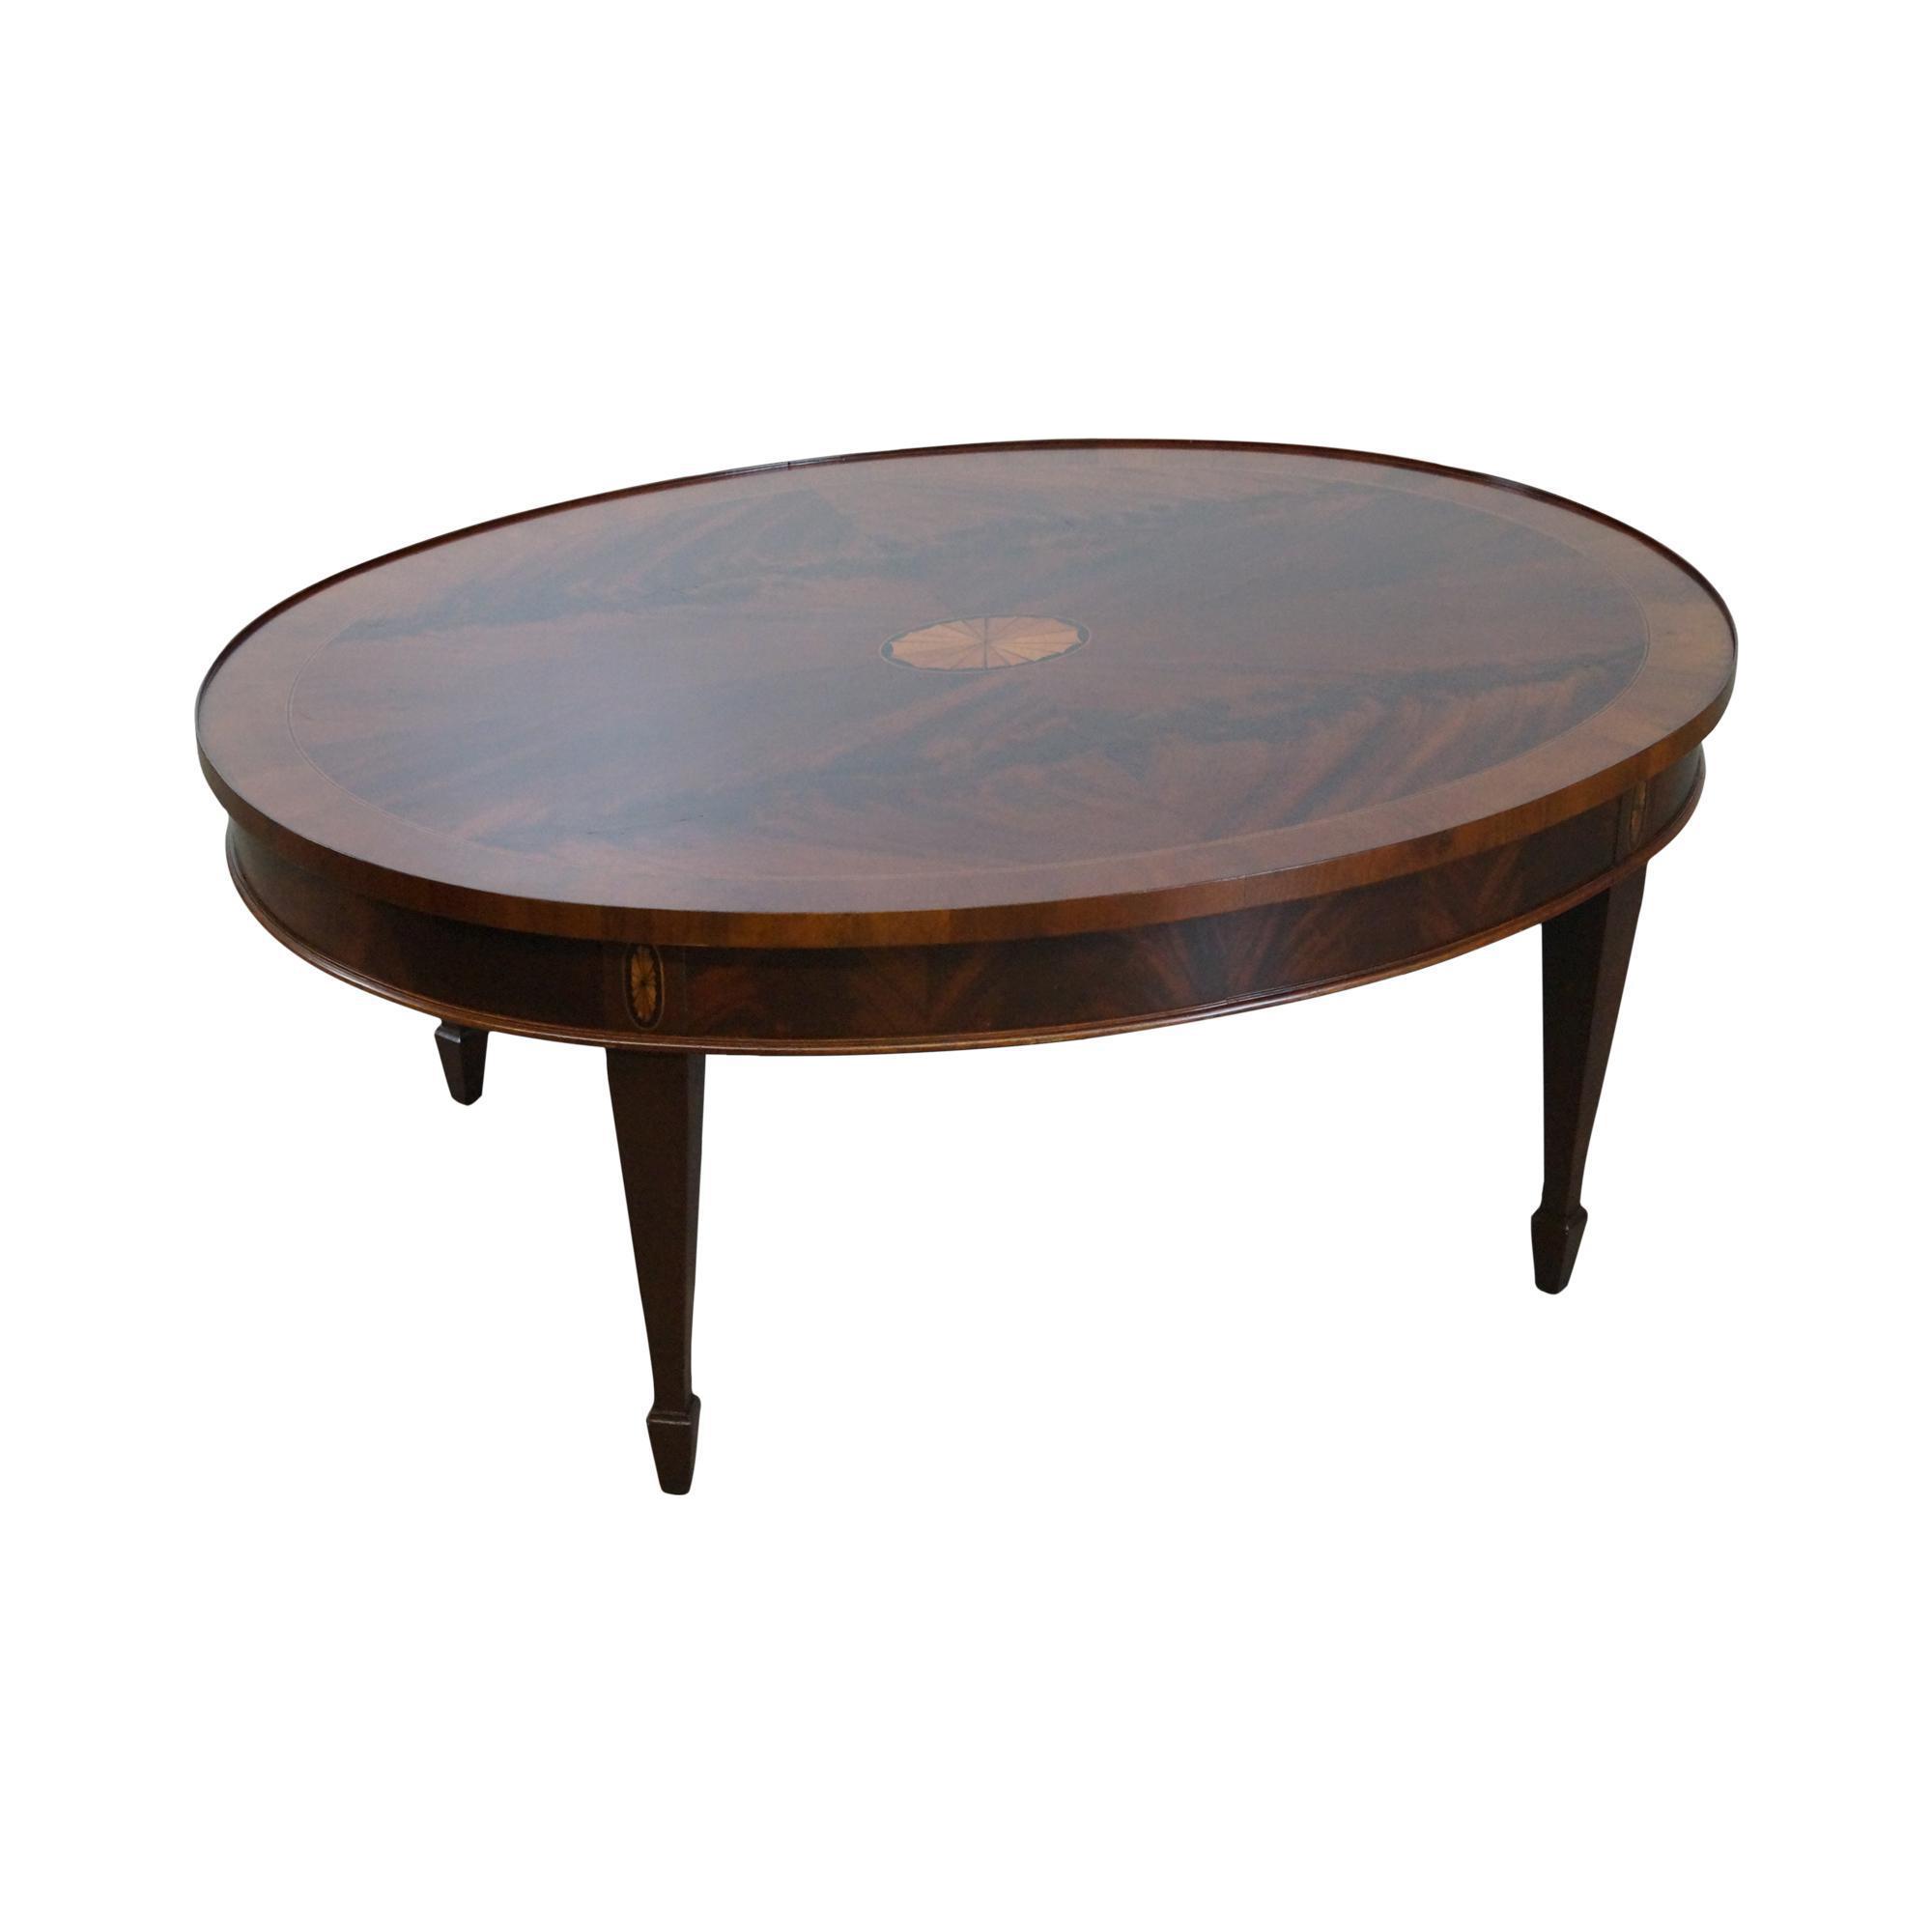 Hekman copley place mahogany oval inlaid coffee table chairish geotapseo Choice Image